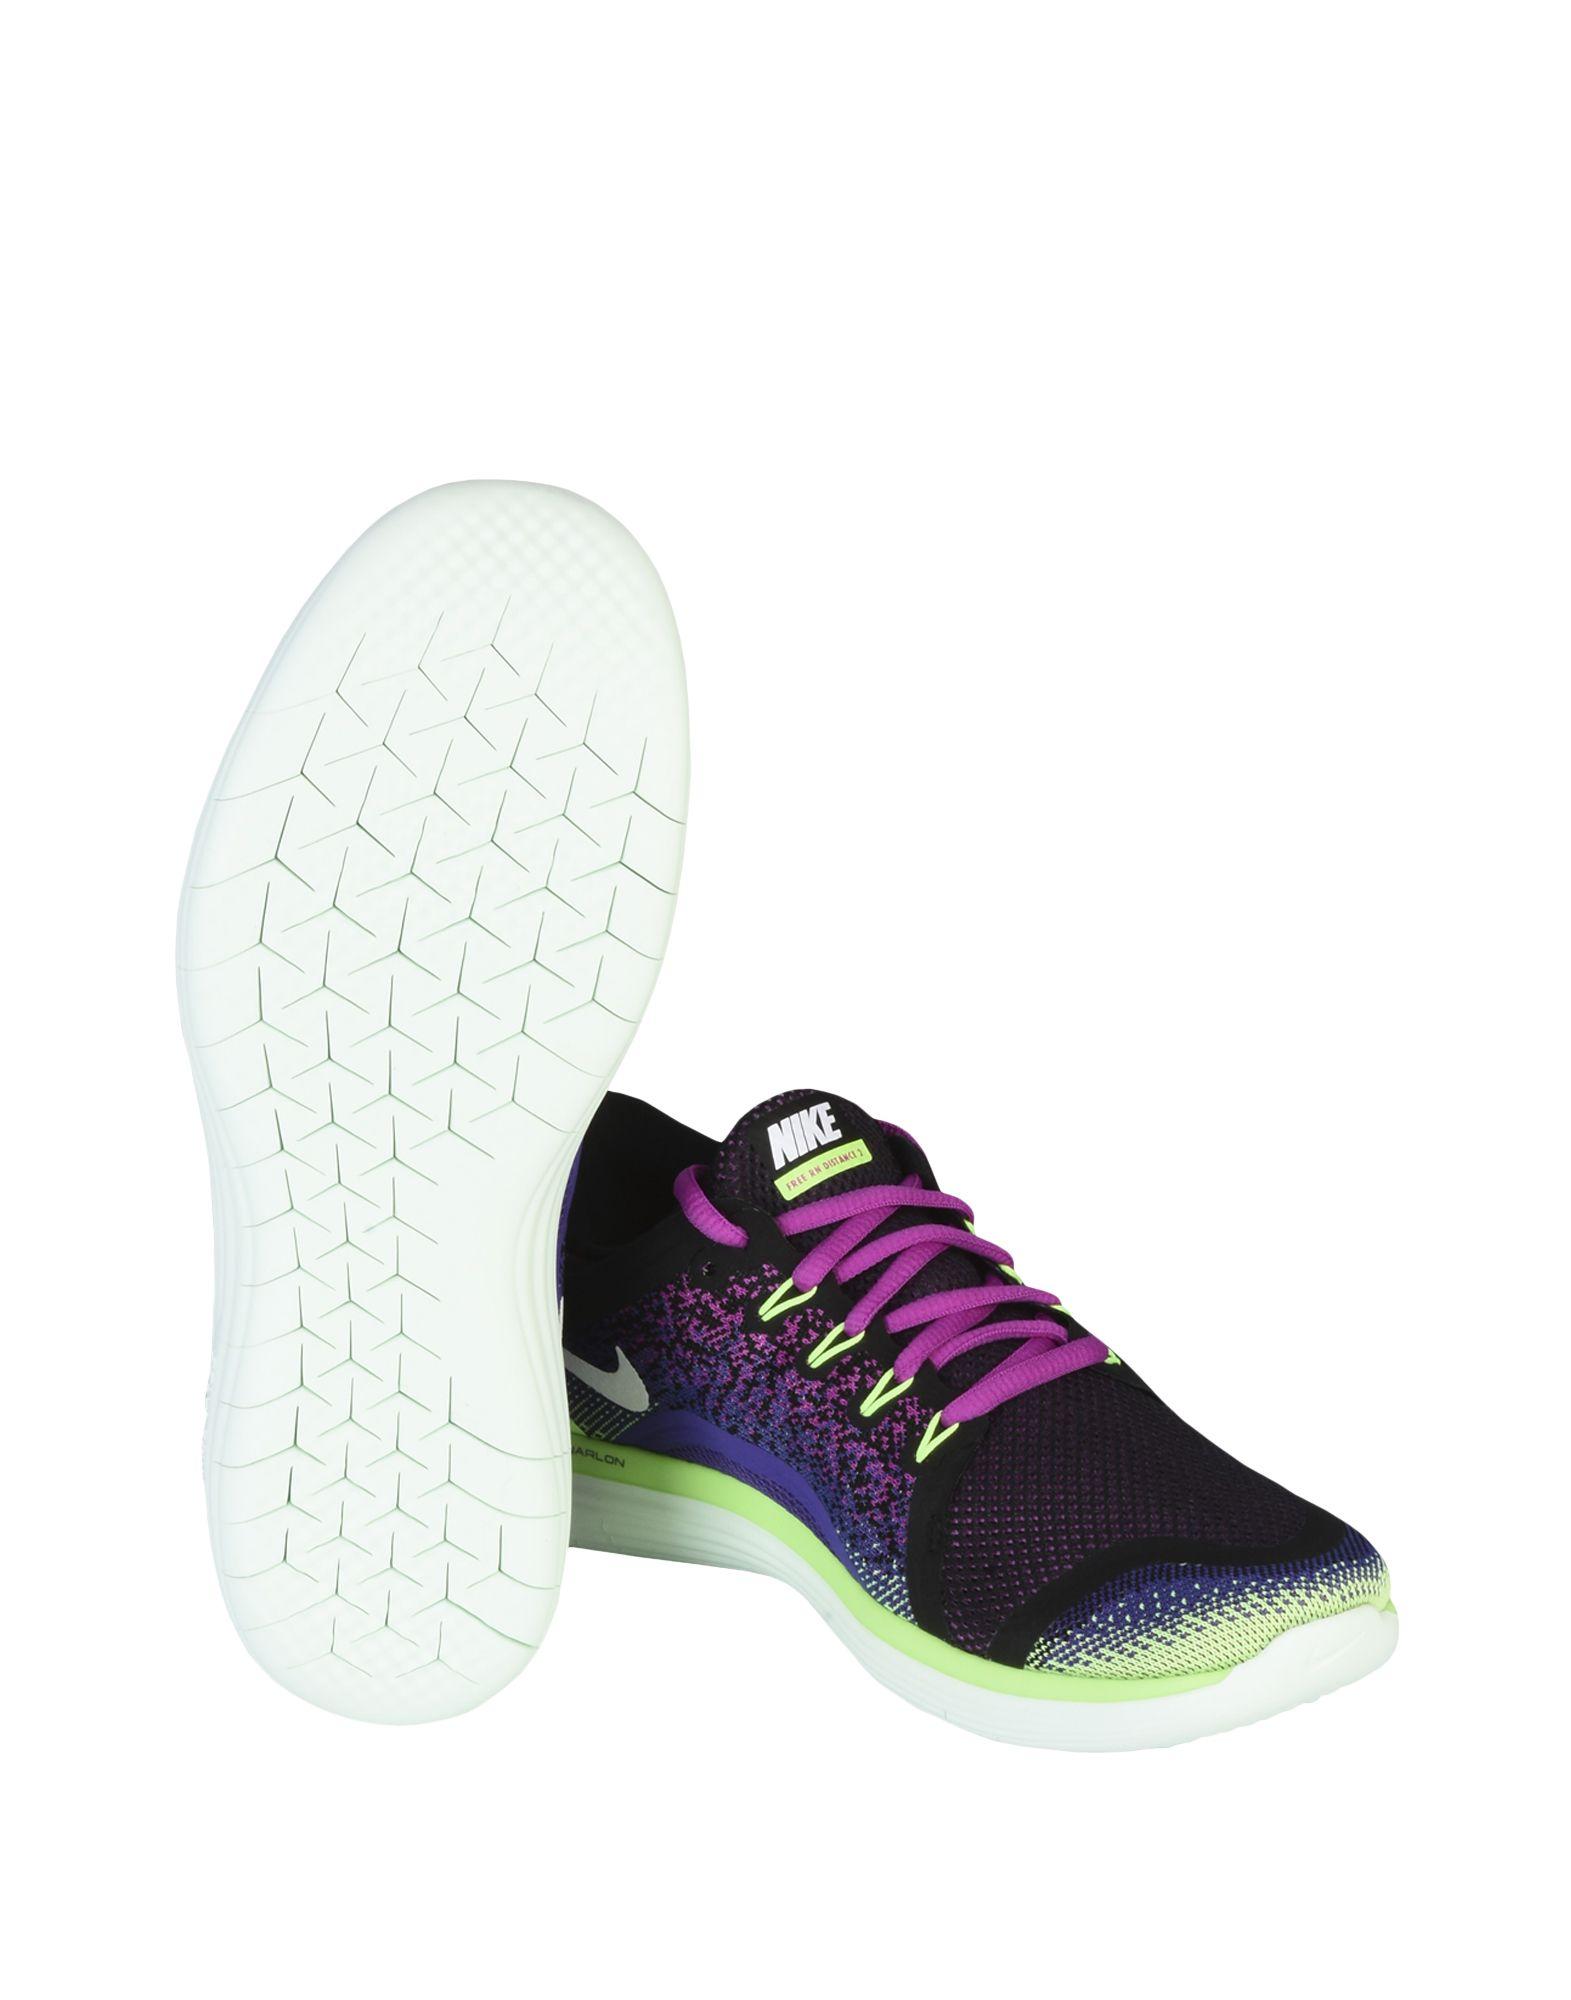 Nike     Free Run Distance 2 - Sneakers - Women Nike Sneakers online on  United Kingdom - 11198244CQ a247a7